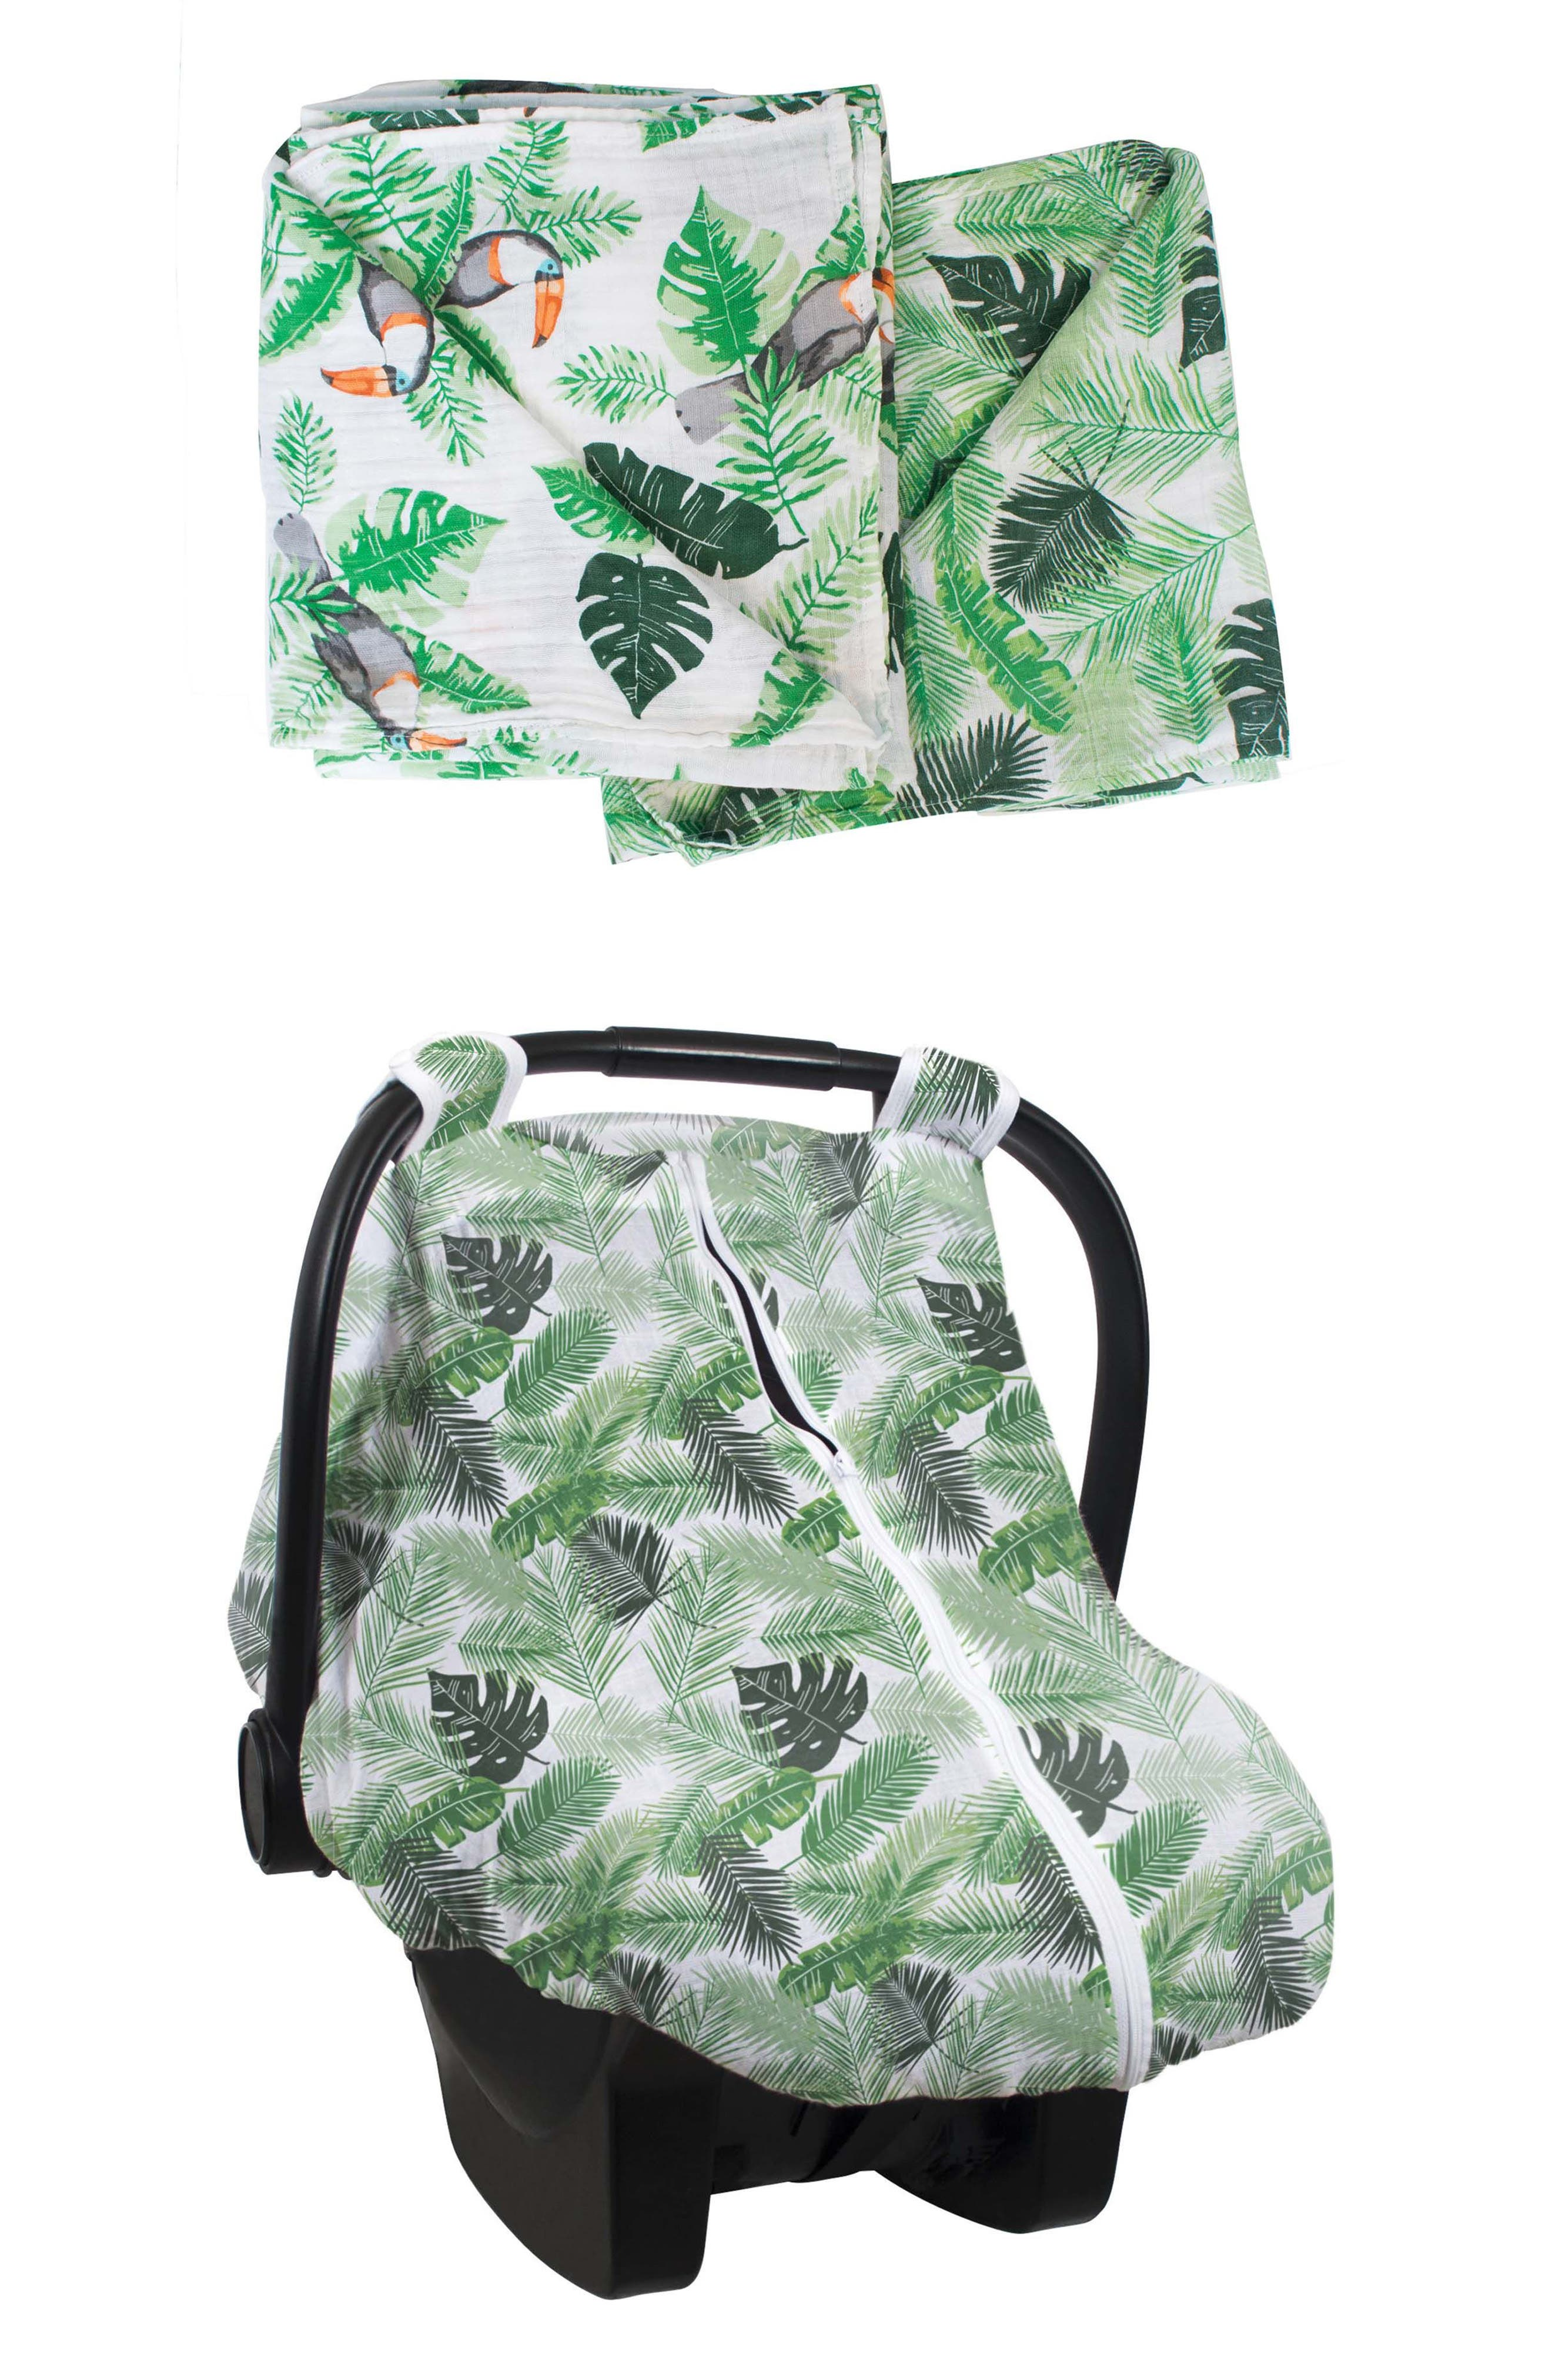 Cotton Muslin Car Seat Cover & Swaddles Set,                             Main thumbnail 1, color,                             RIO & PALMS